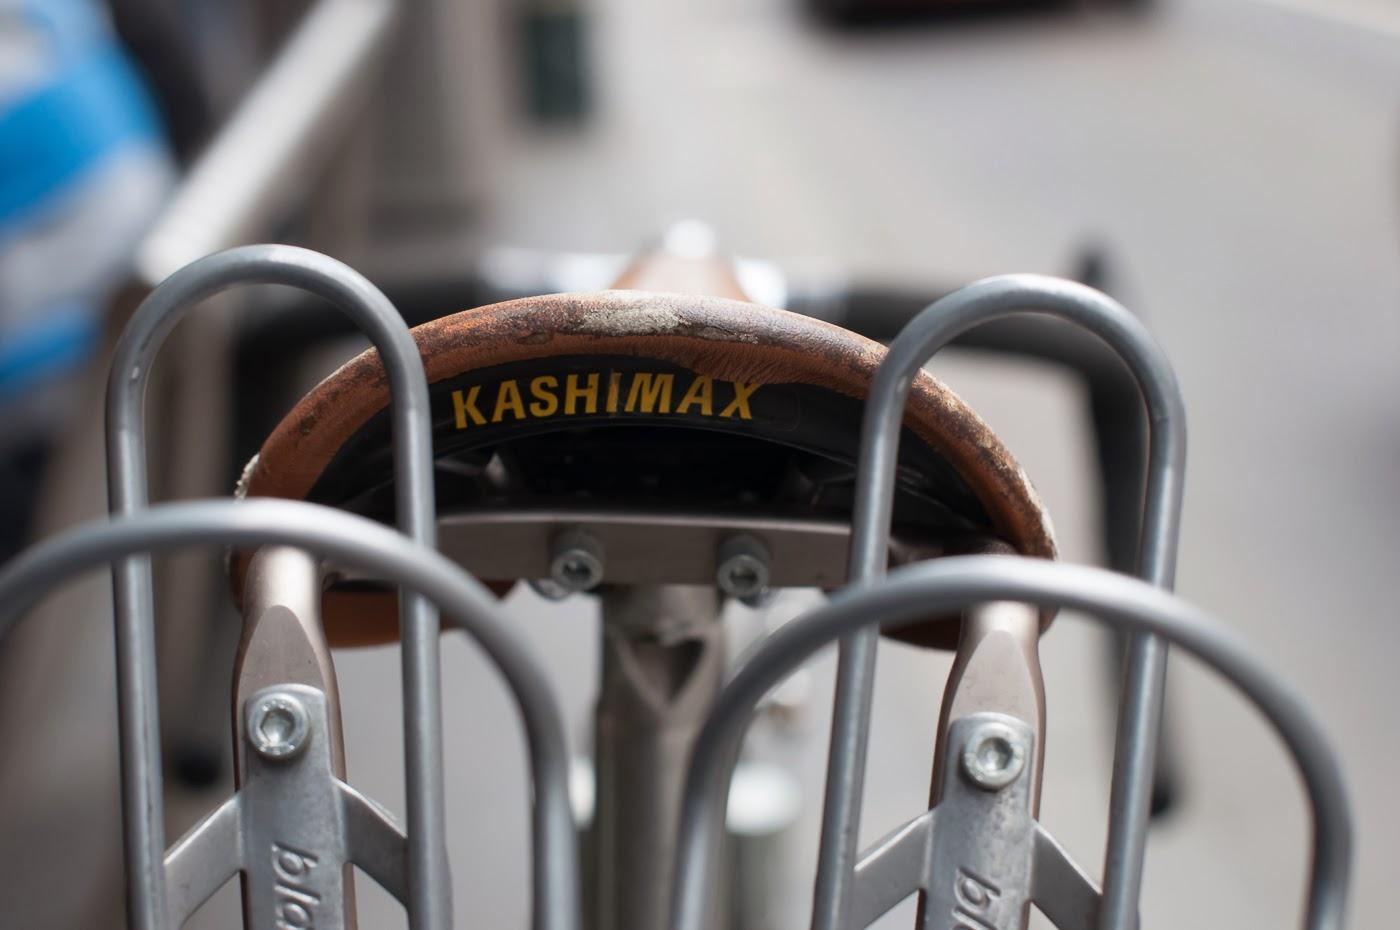 njs, single speed, bike, bicycle, tim macauley, the biketorialist, melbourne, track frame, conversion, presto, kashimax, saddle